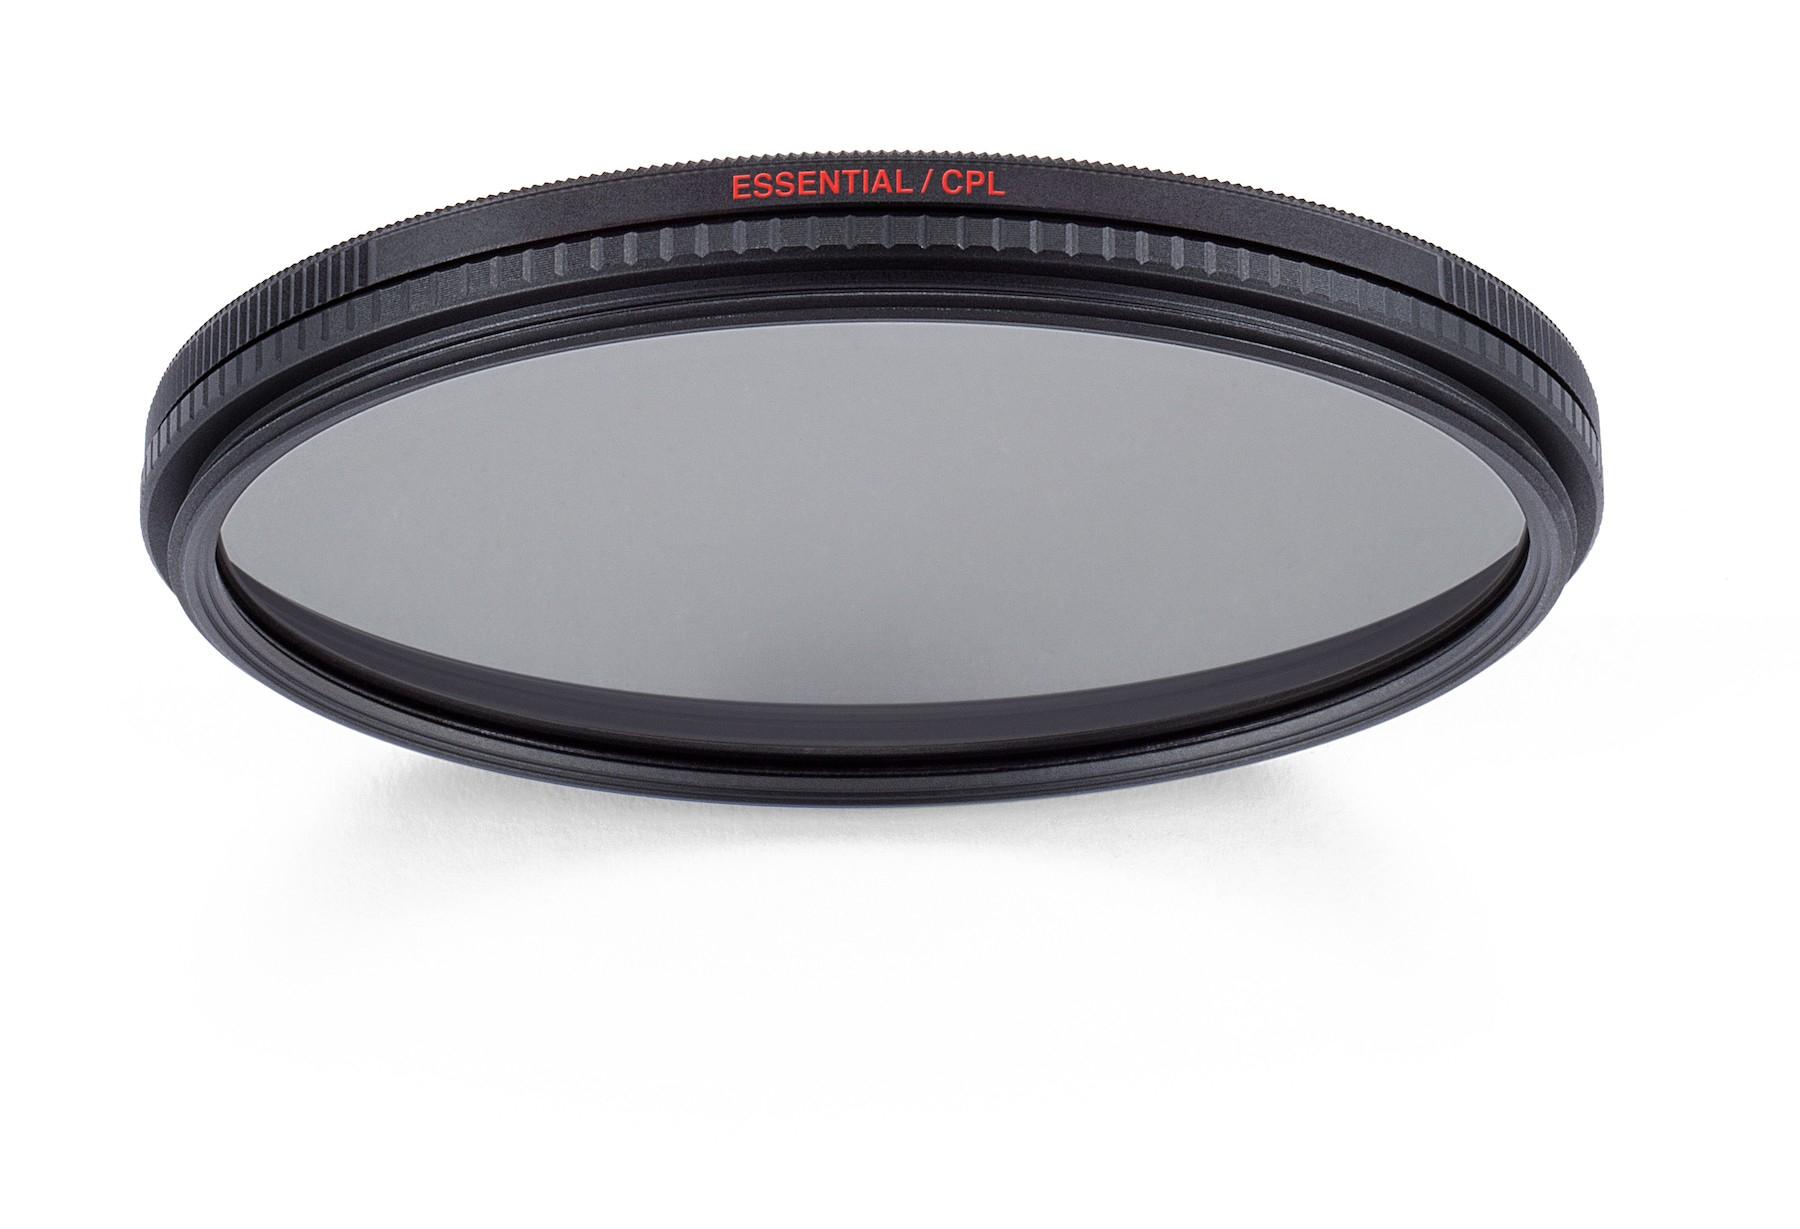 72mm Essential Circular Polarizing Filter